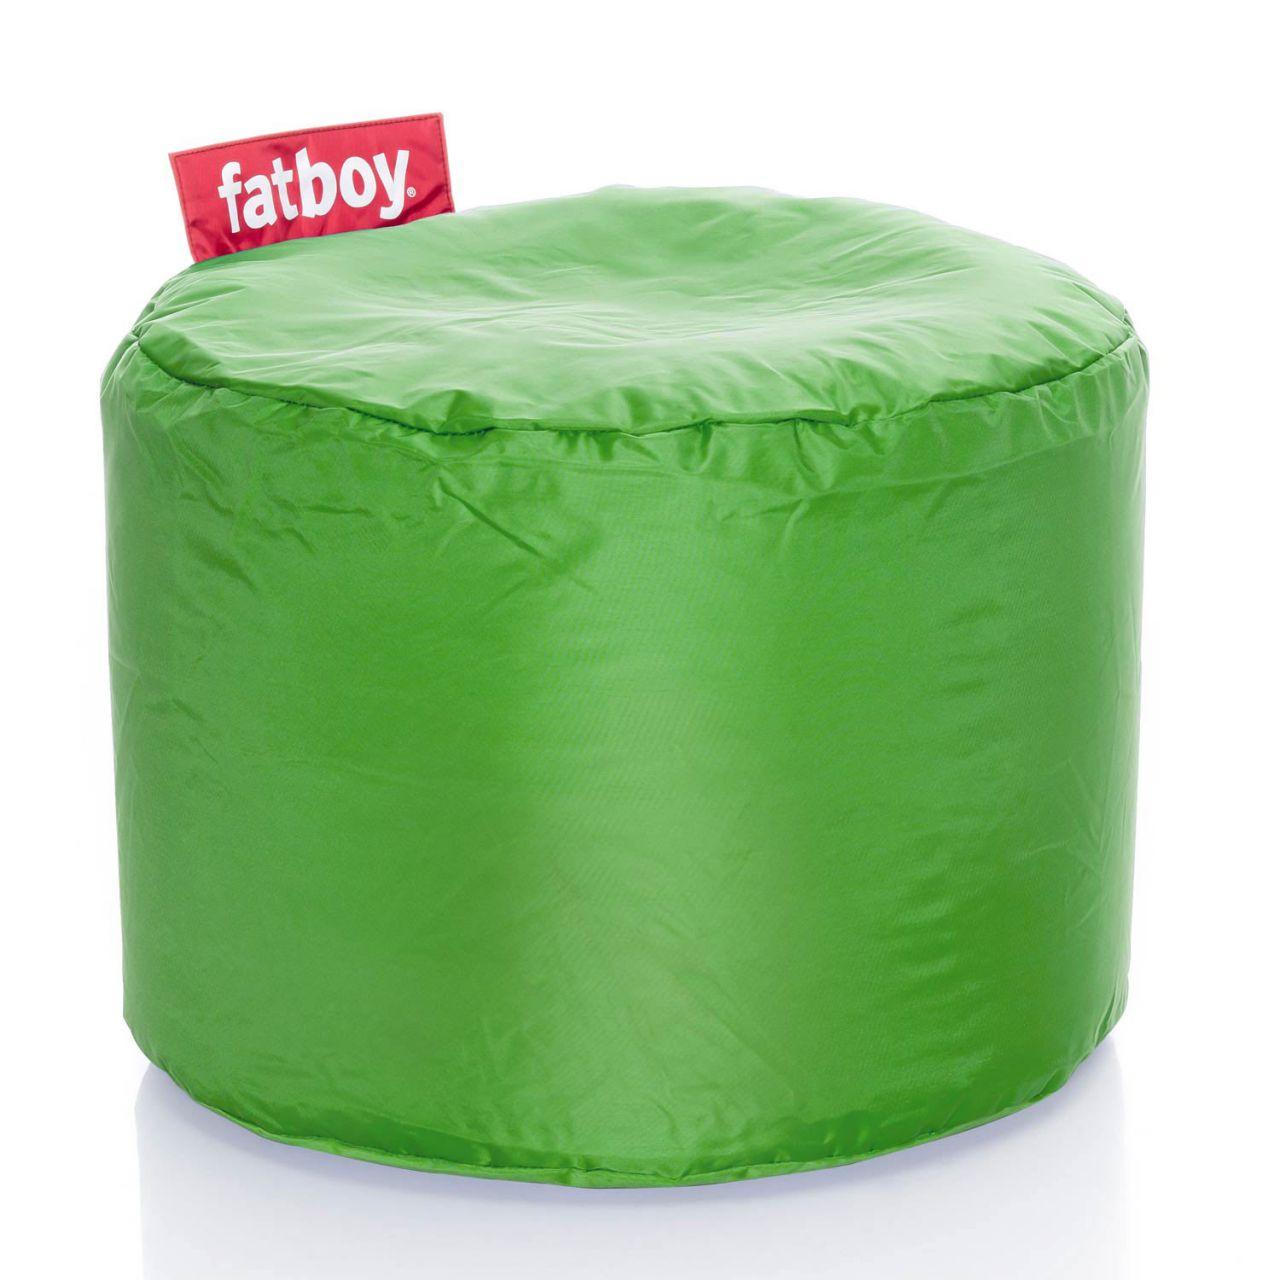 Fatboy - Point Sitzhocker 900.0155